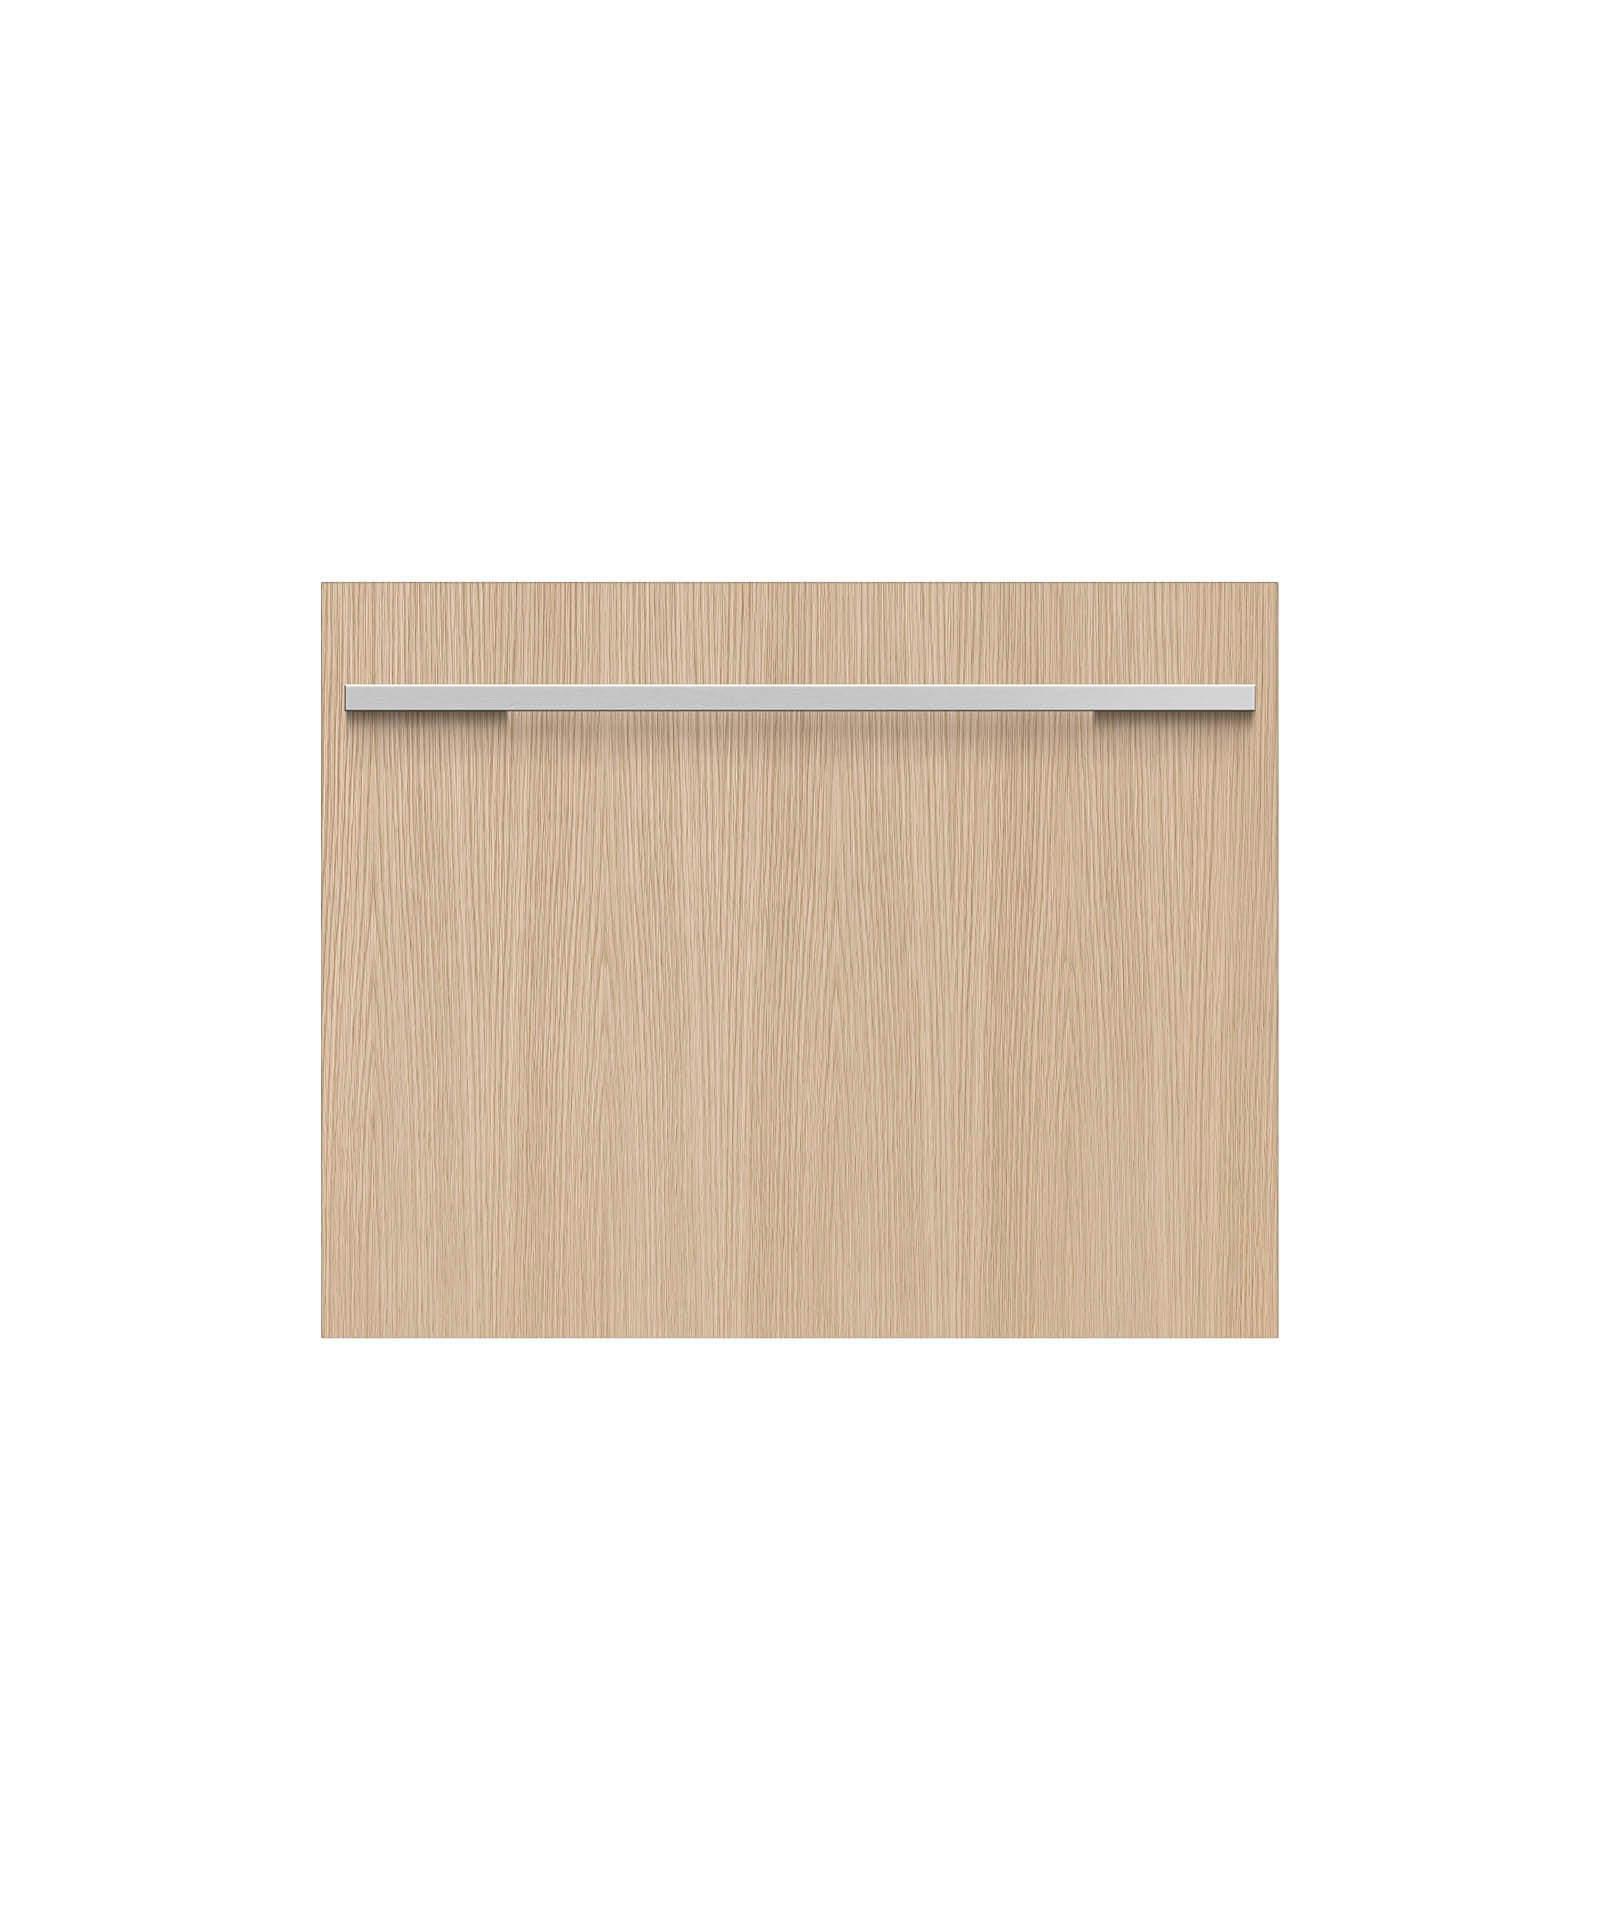 DishDrawer™ Dishwasher, 7 Place Settings, Panel Ready (Tall)